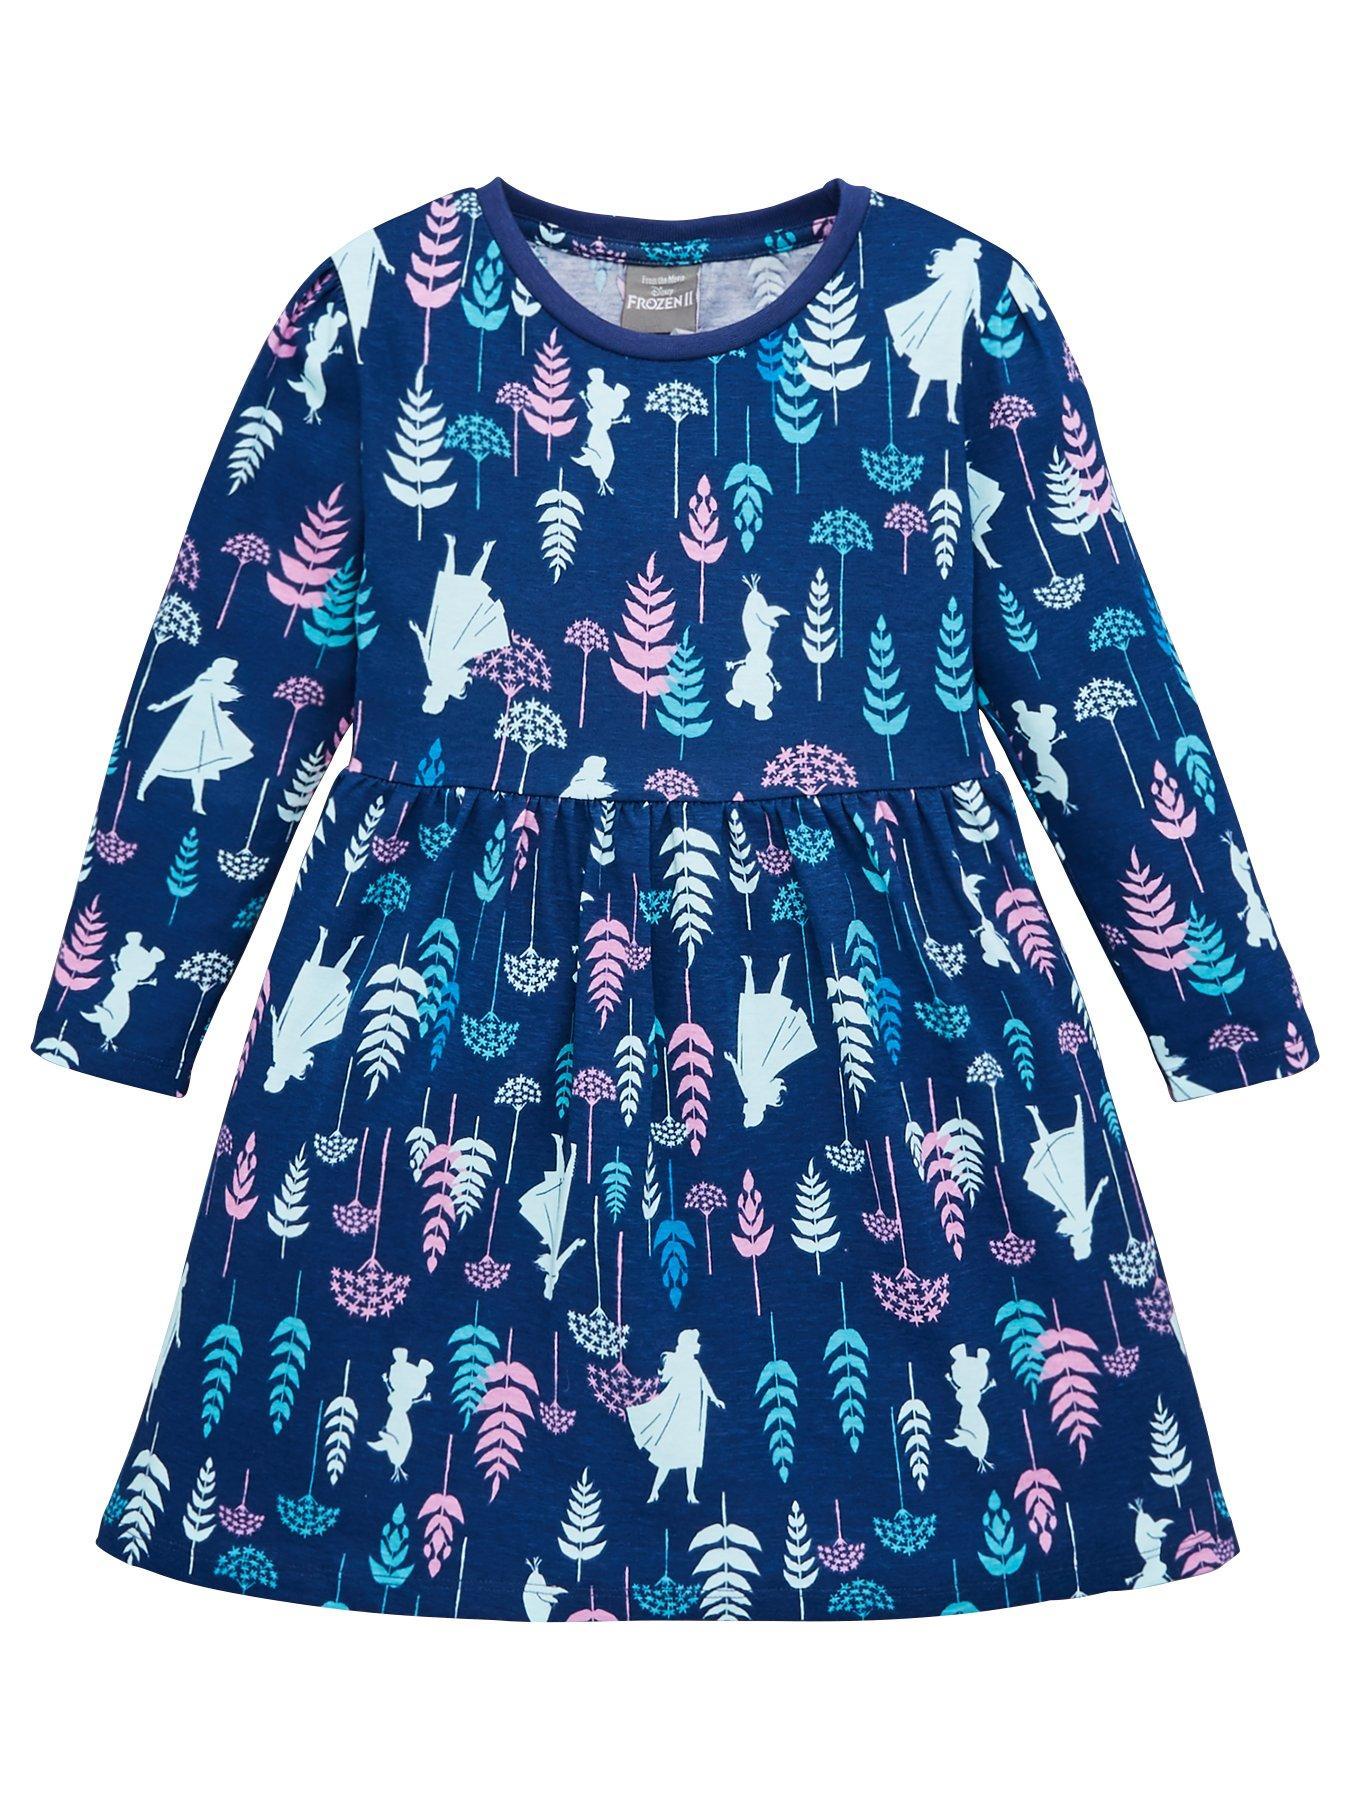 AOVCLKID Vampirina Toddler Night Gown Little Girls Pajamas Dress